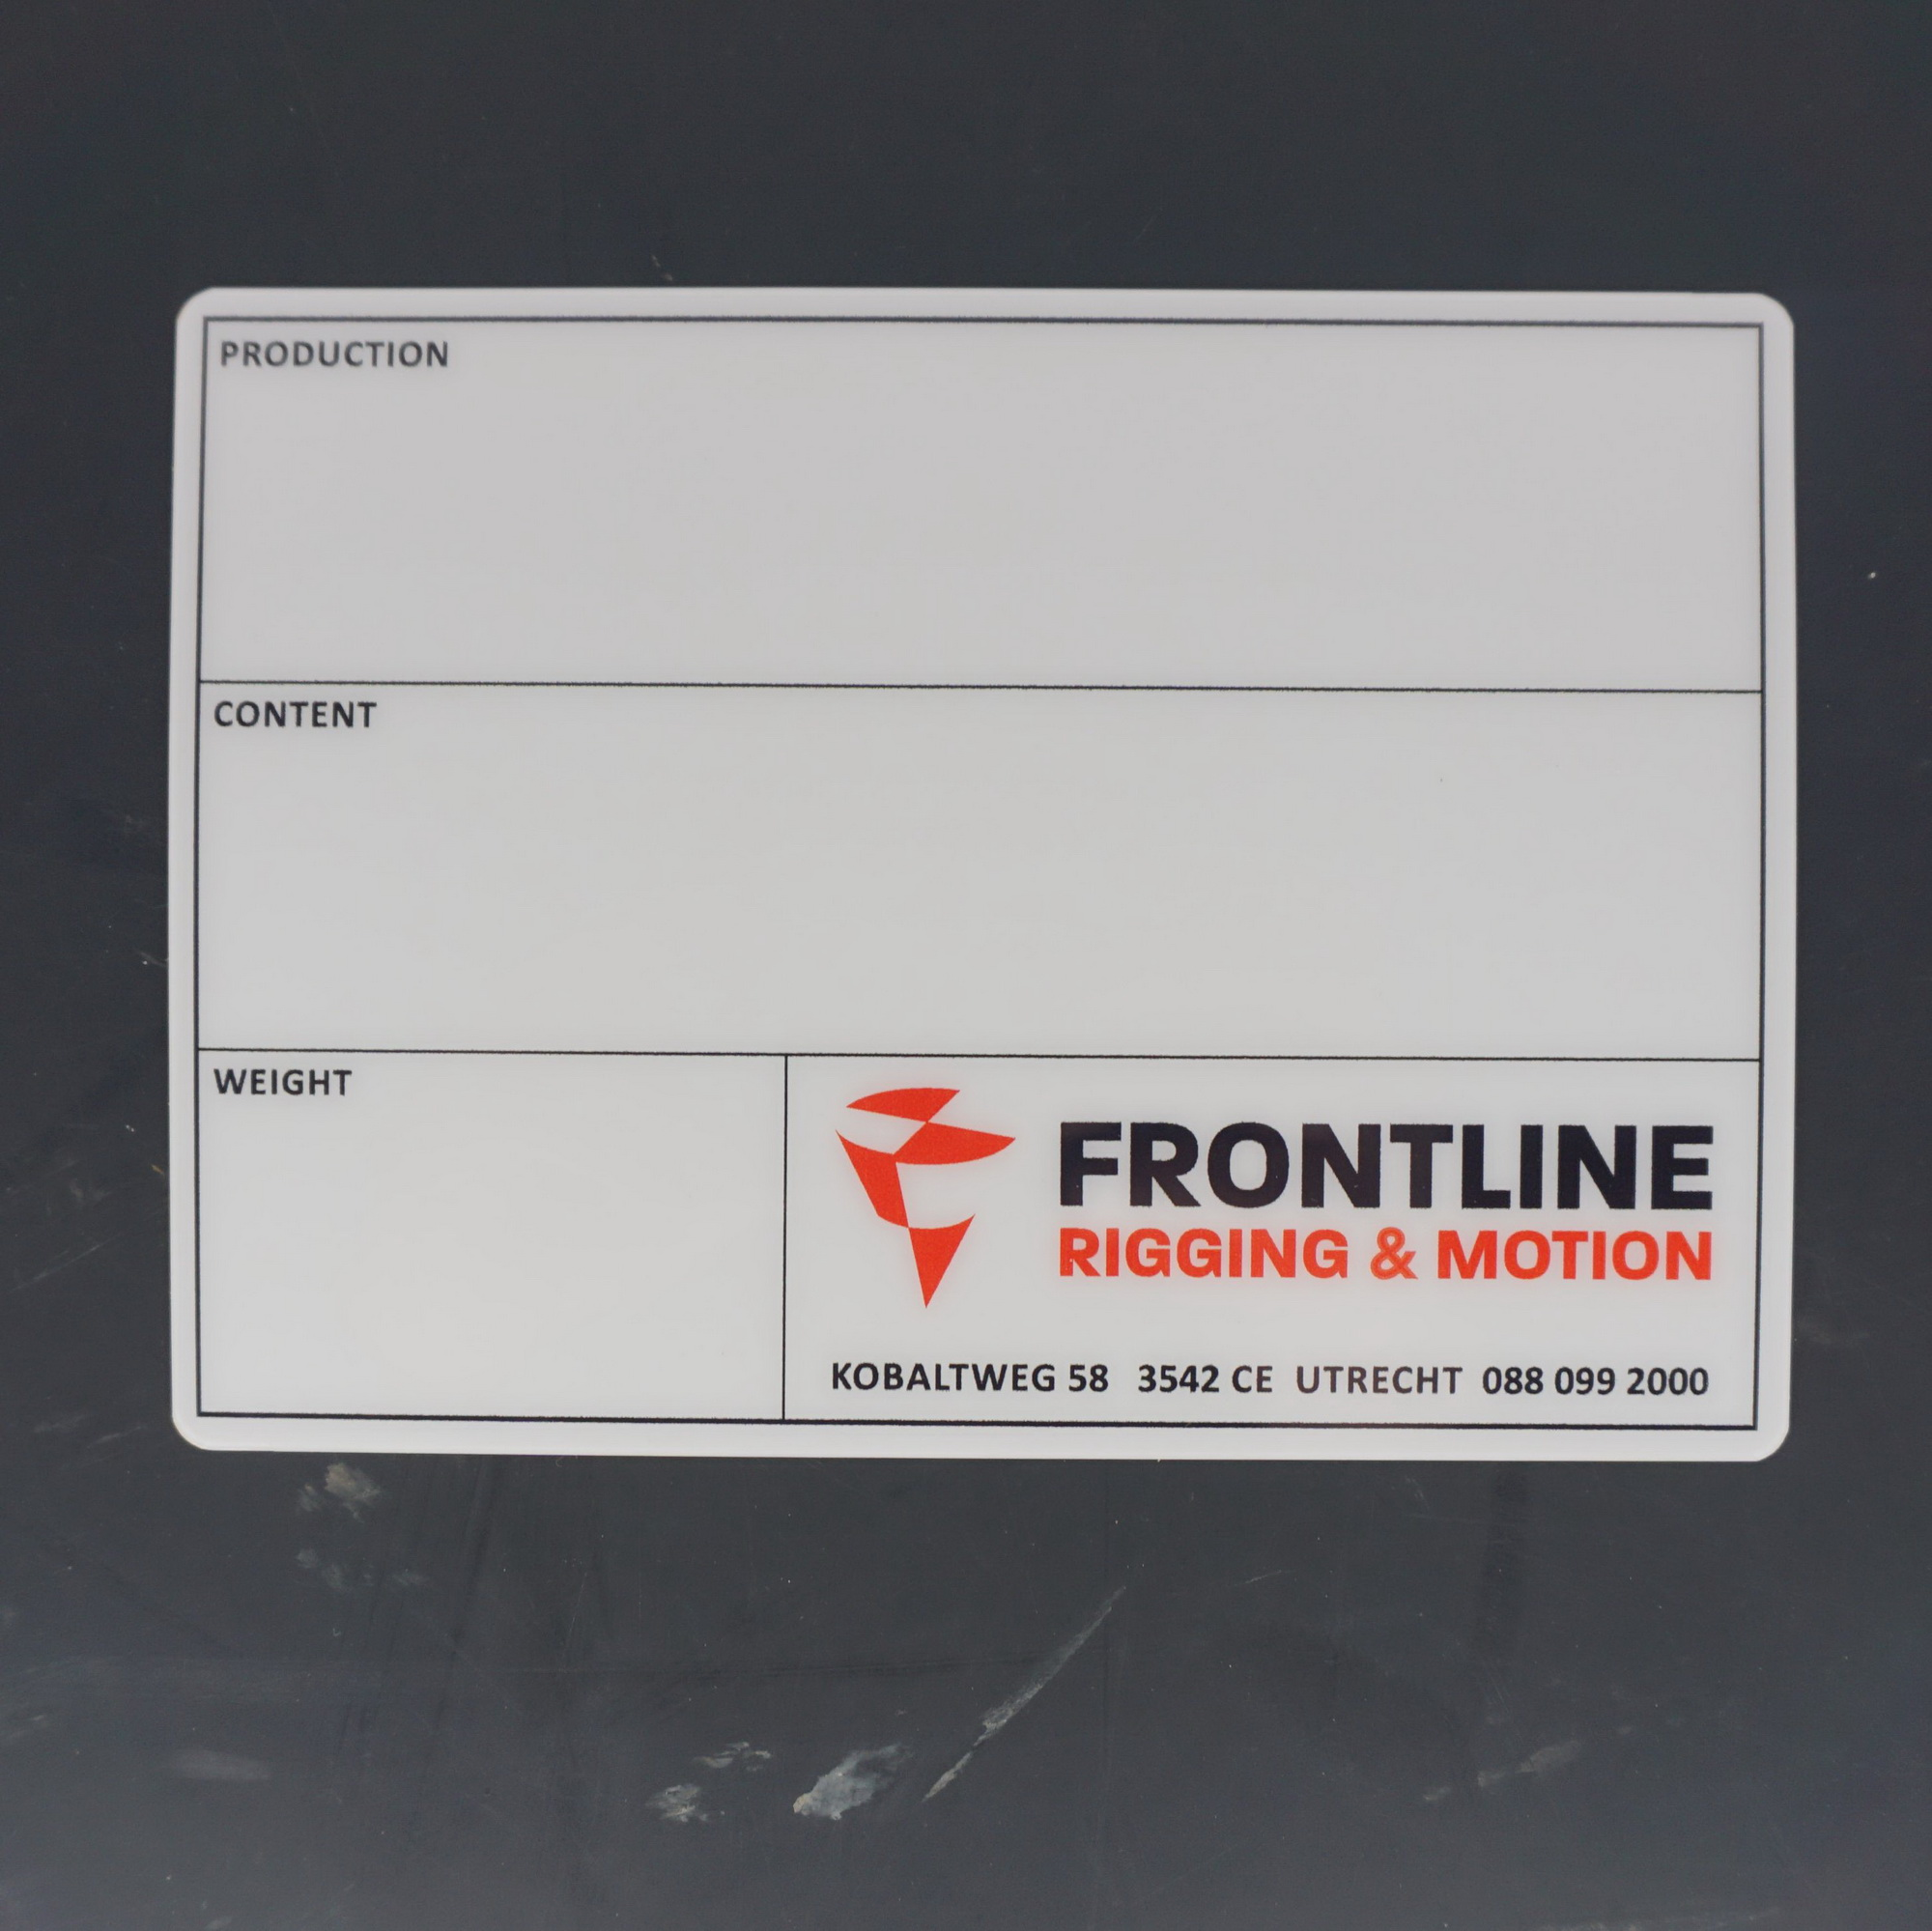 Flightcaselabels Caselabels Frontline Rigging